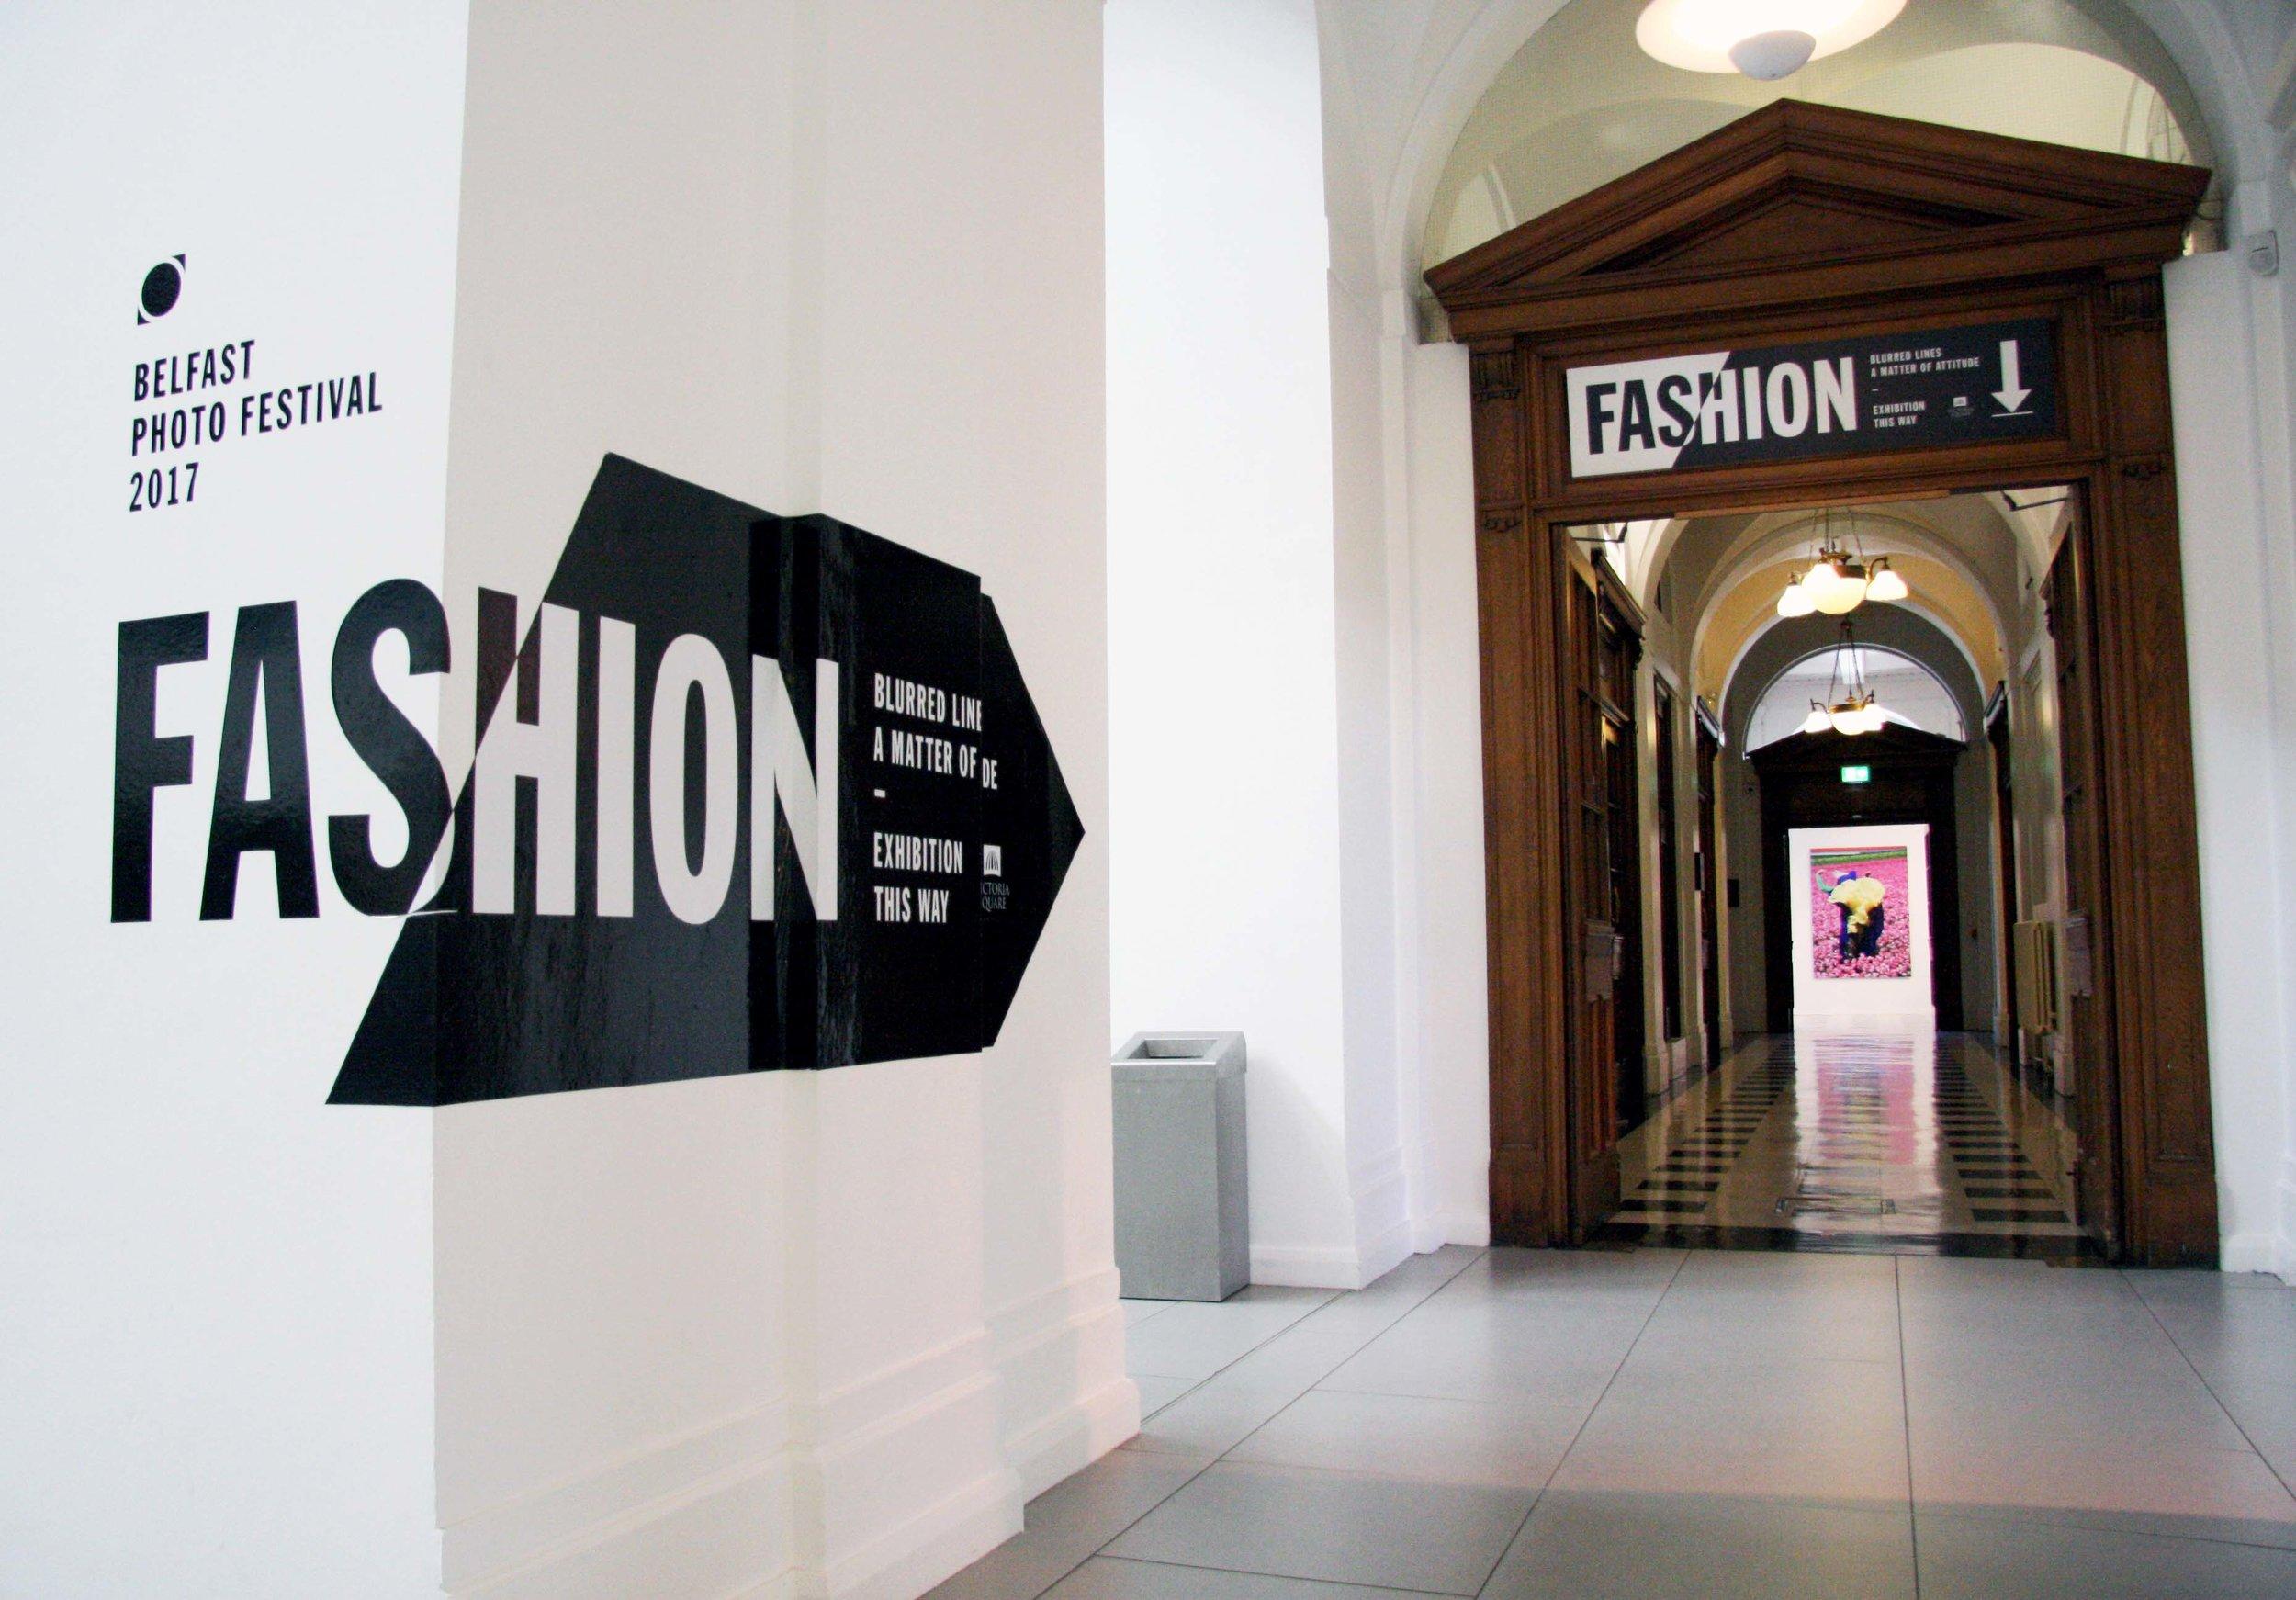 Belfast Photo Festival - Fashion.jpg